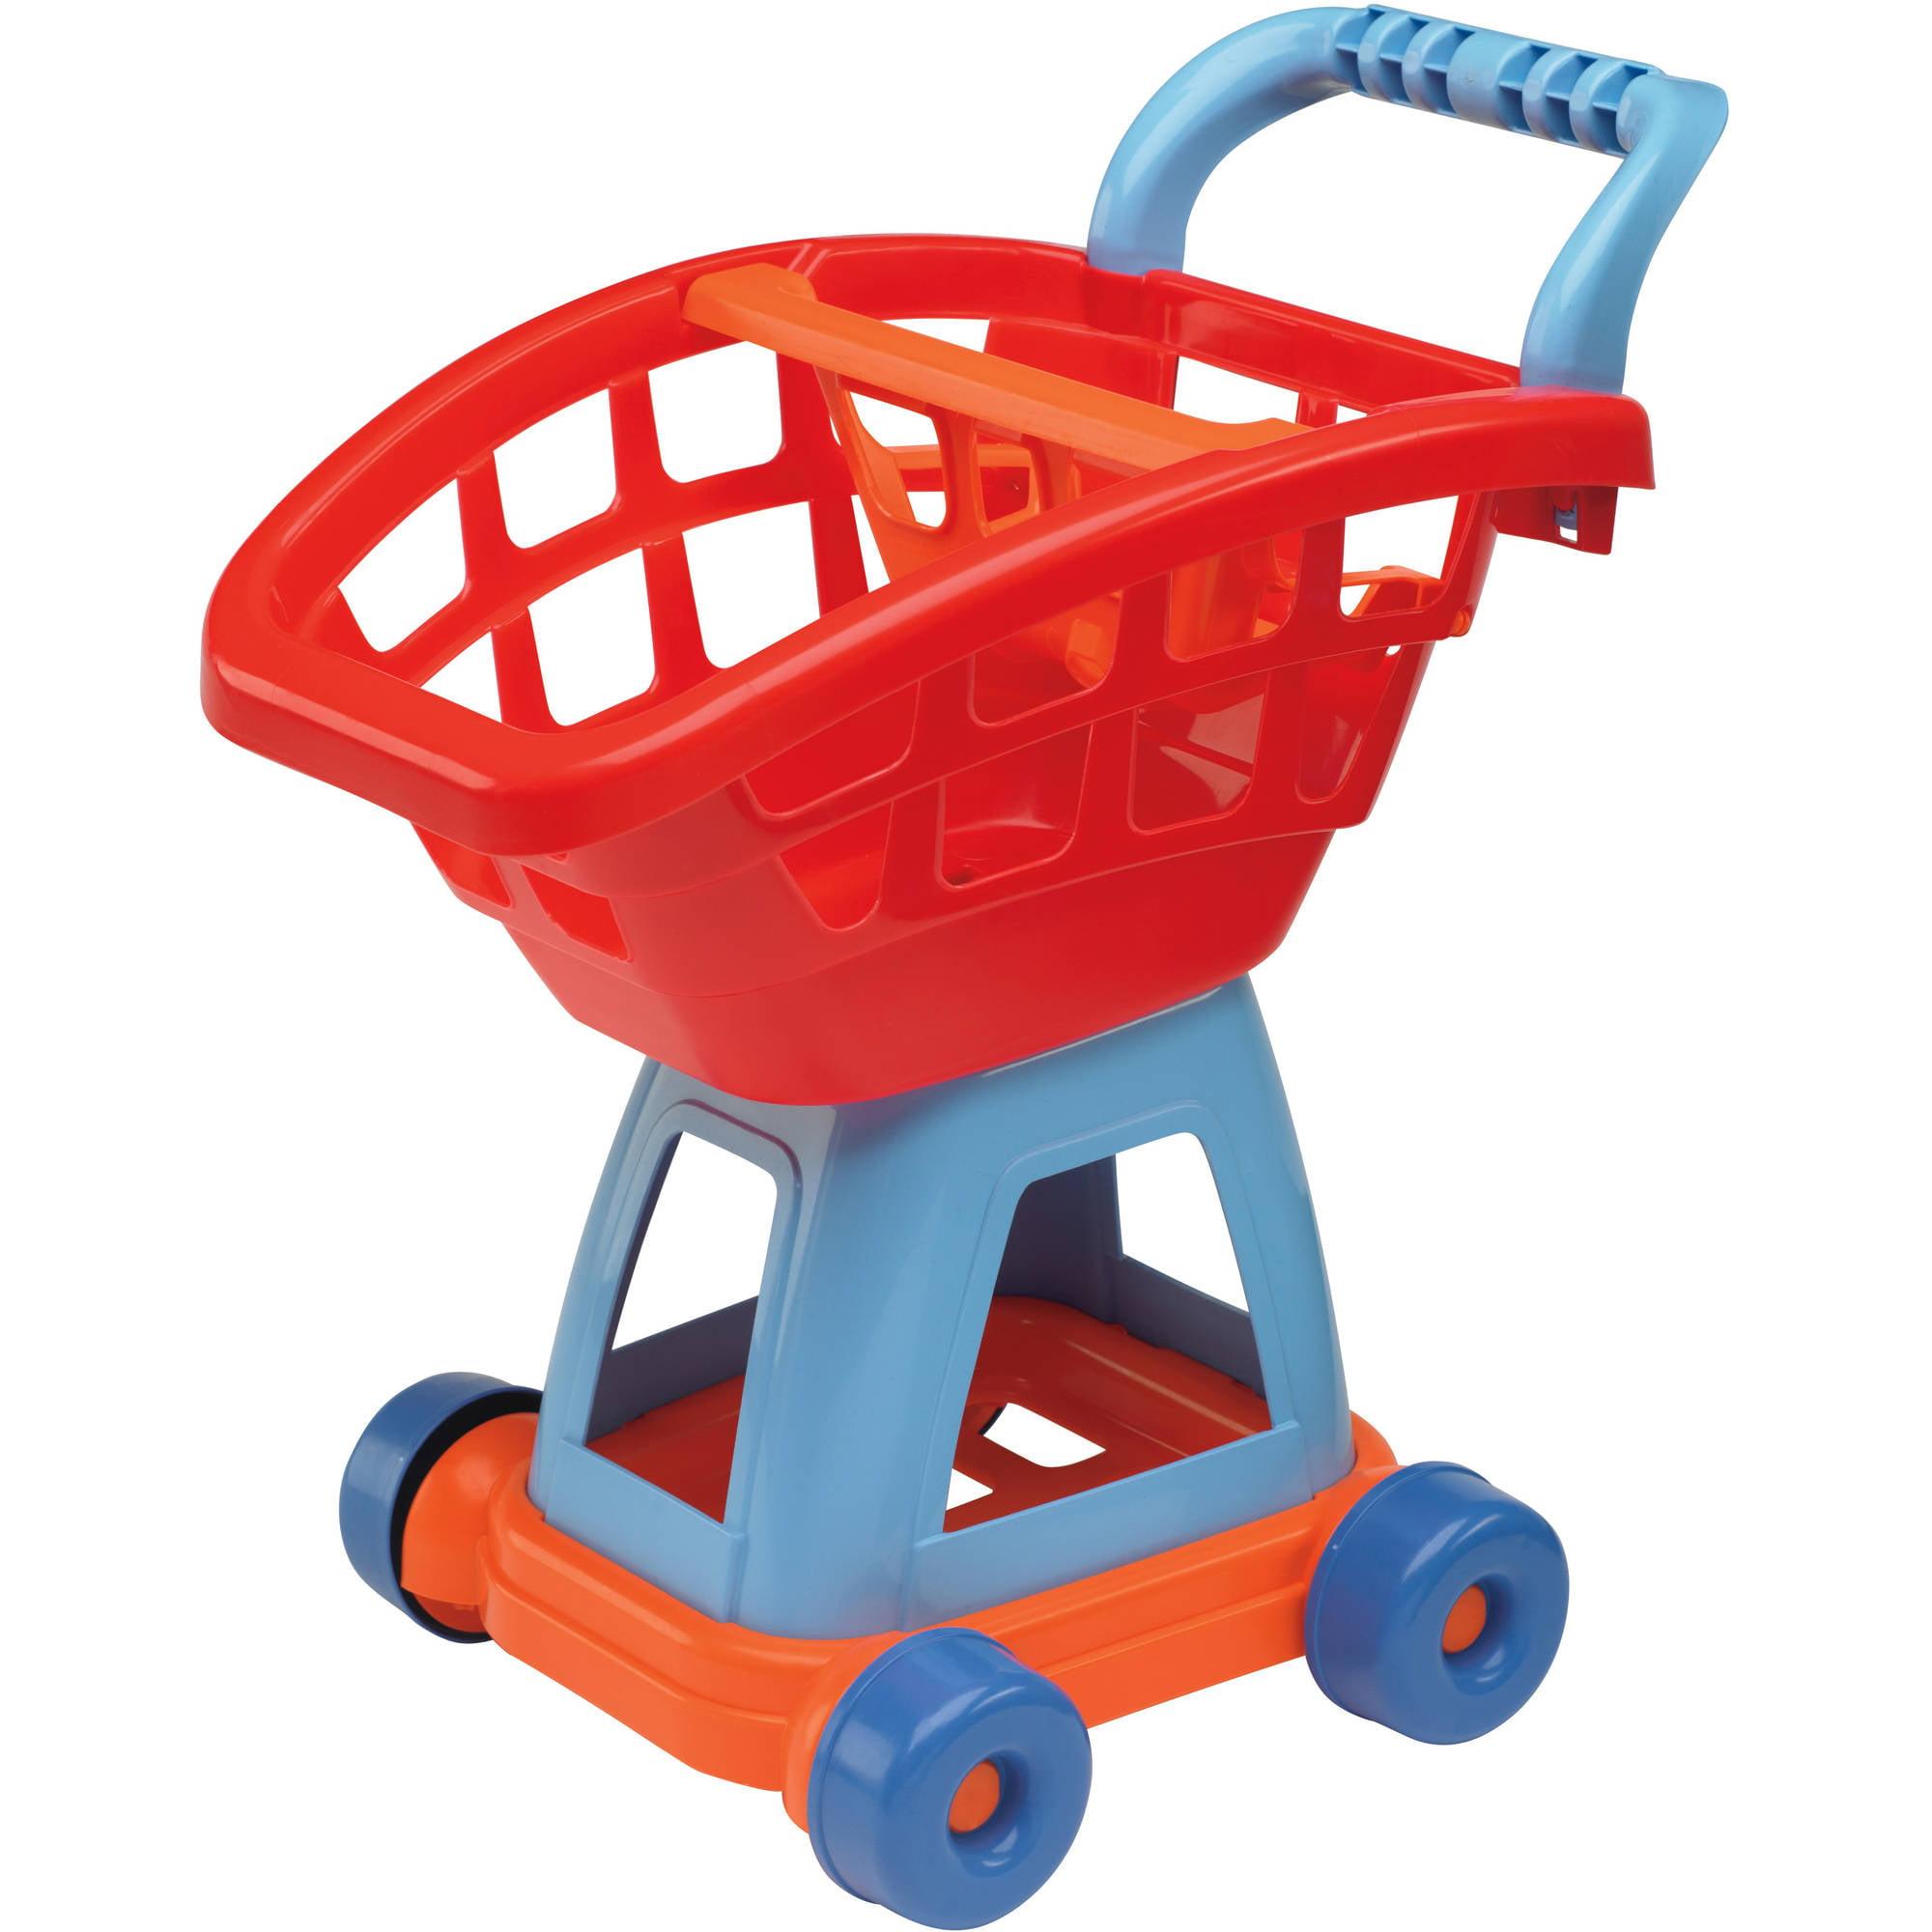 American Plastic Toys Kid's Cart